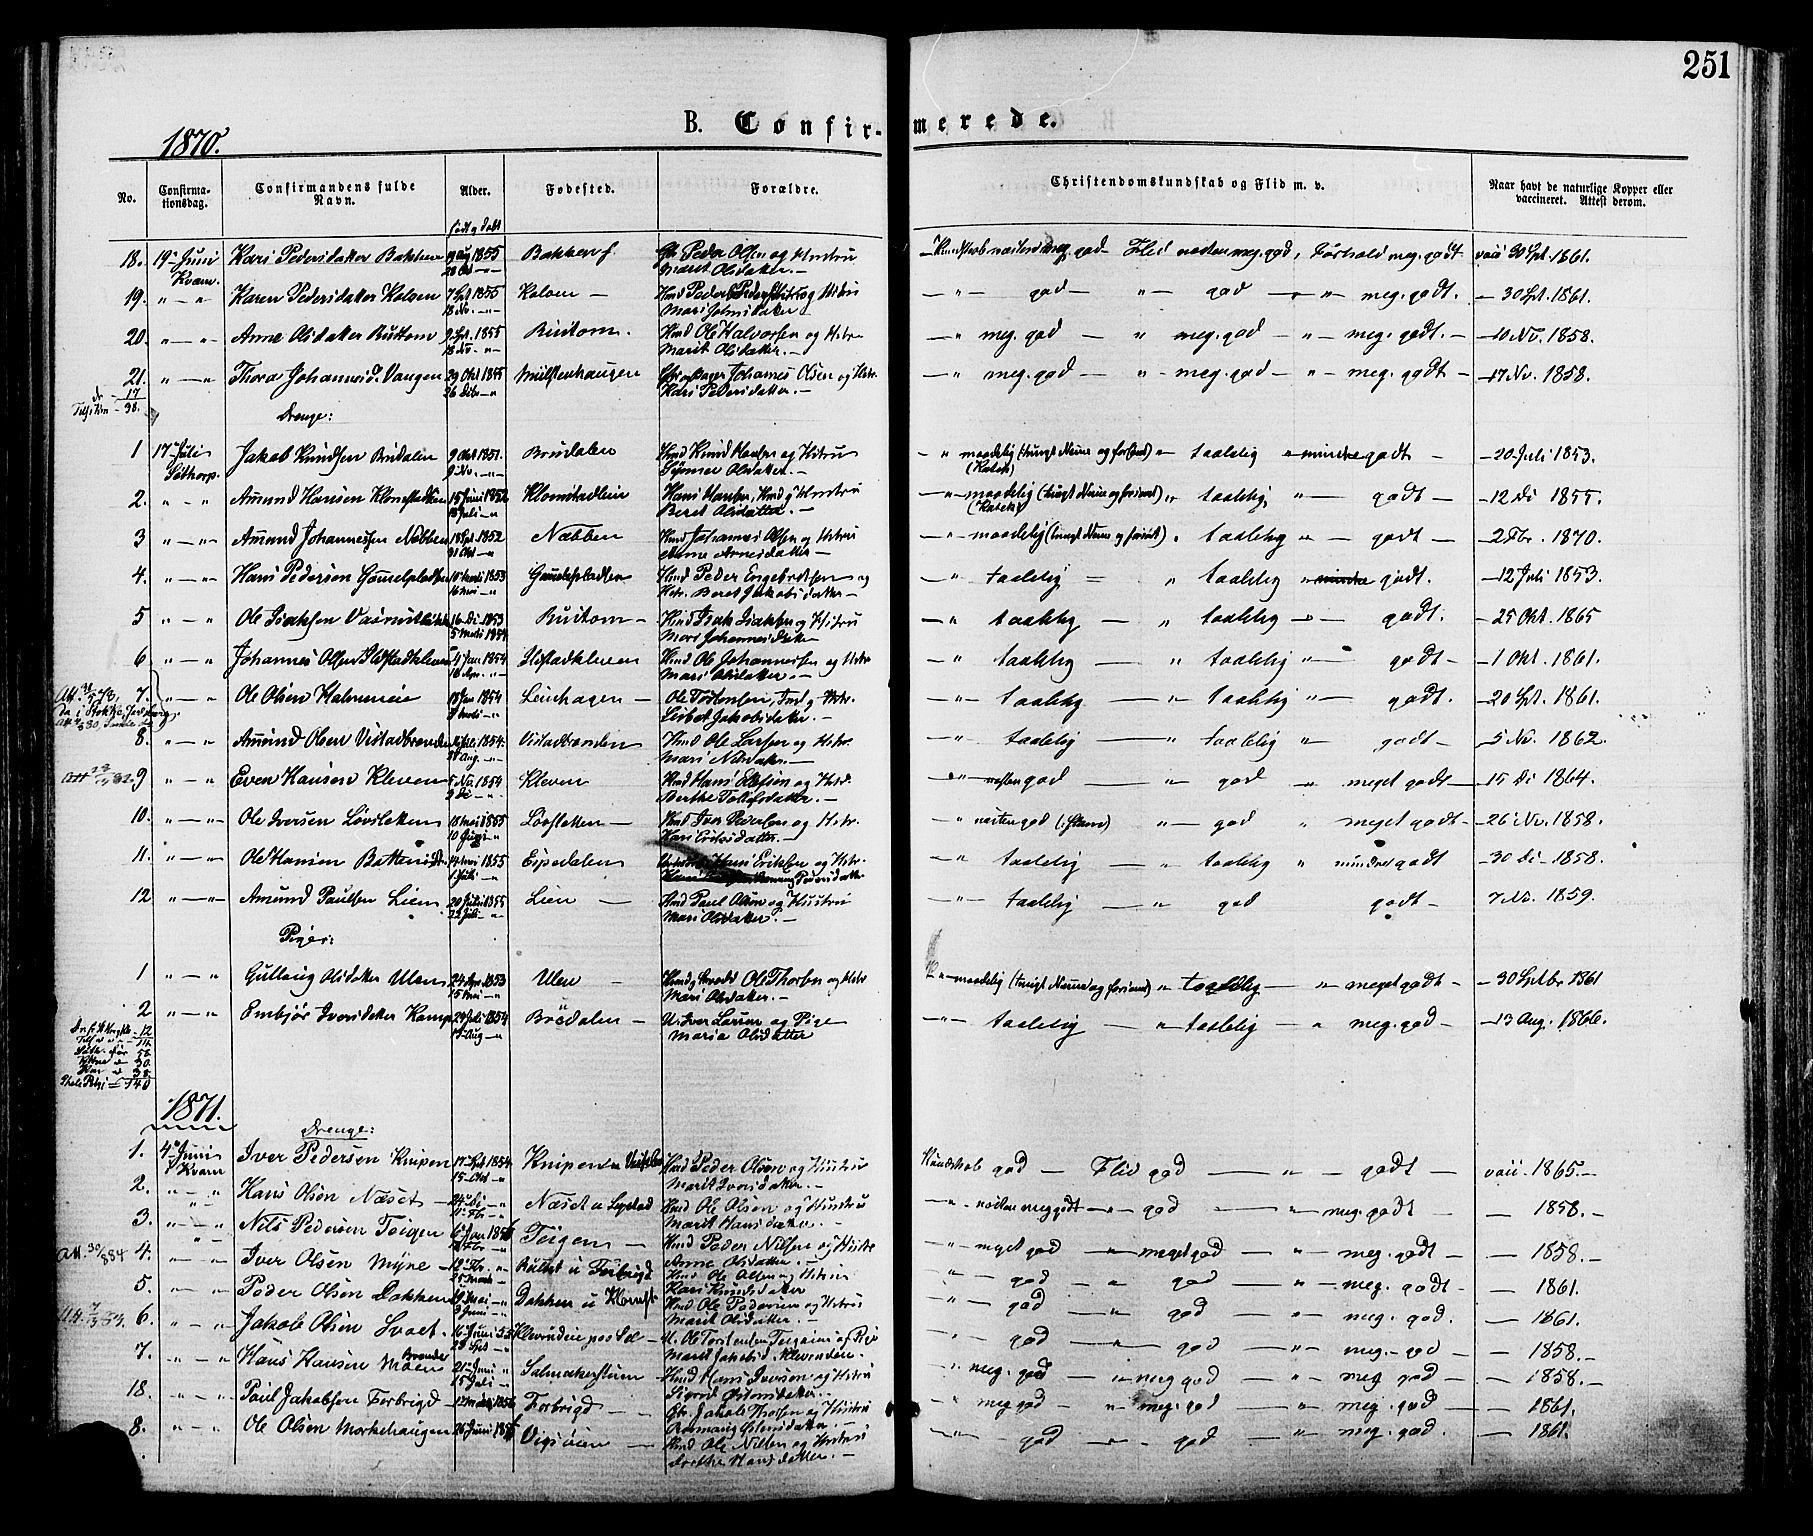 SAH, Nord-Fron prestekontor, Ministerialbok nr. 2, 1865-1883, s. 251